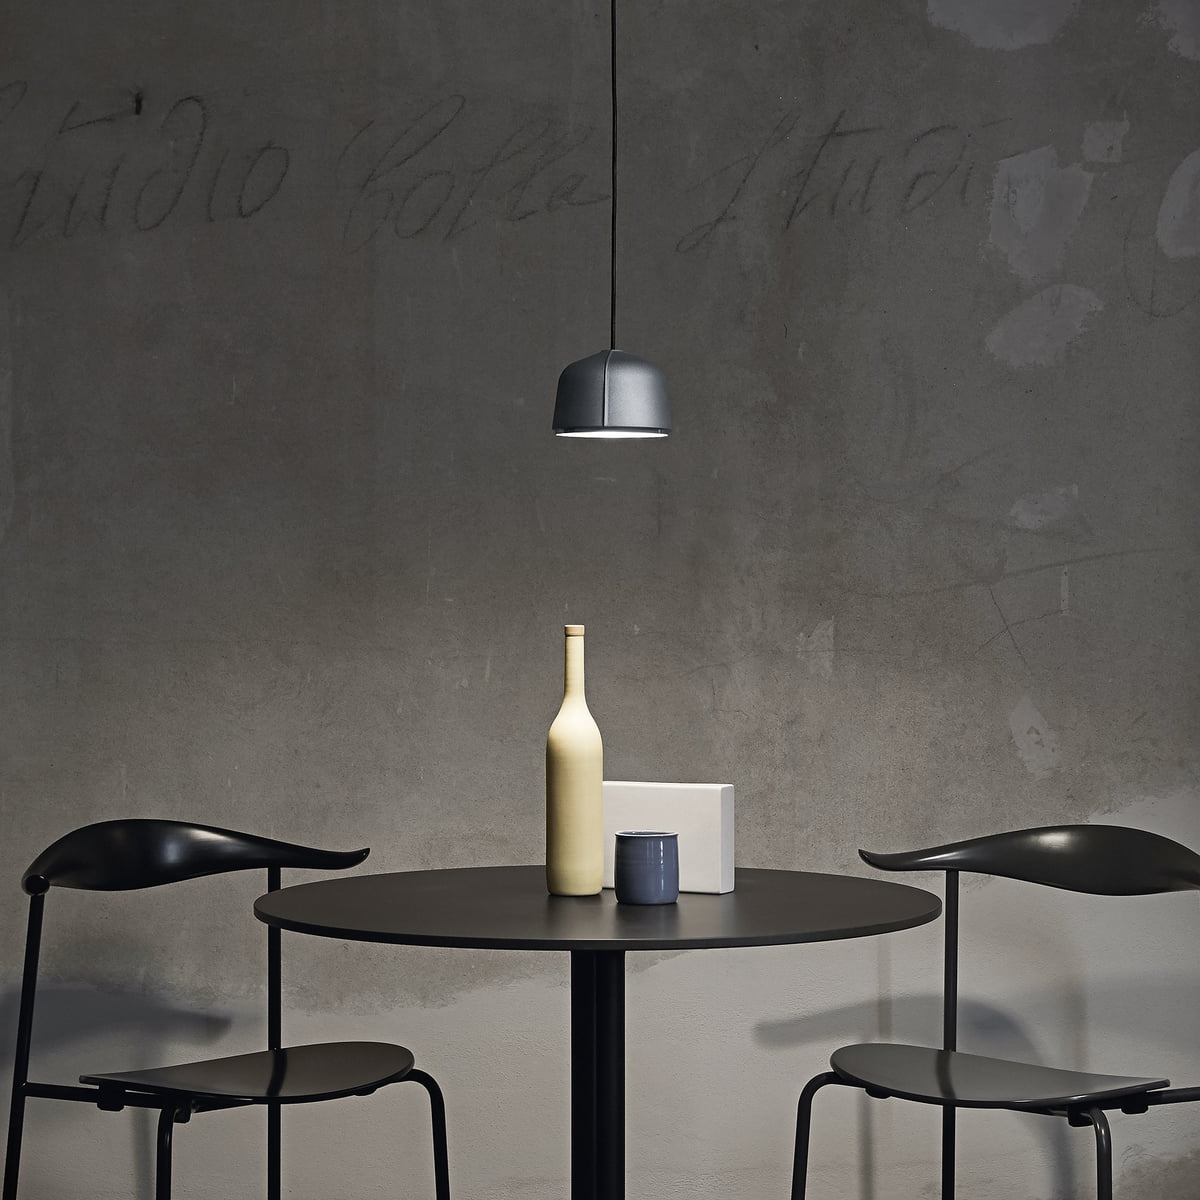 Arumi Pendelleuchte LED von Foscarini | Shop